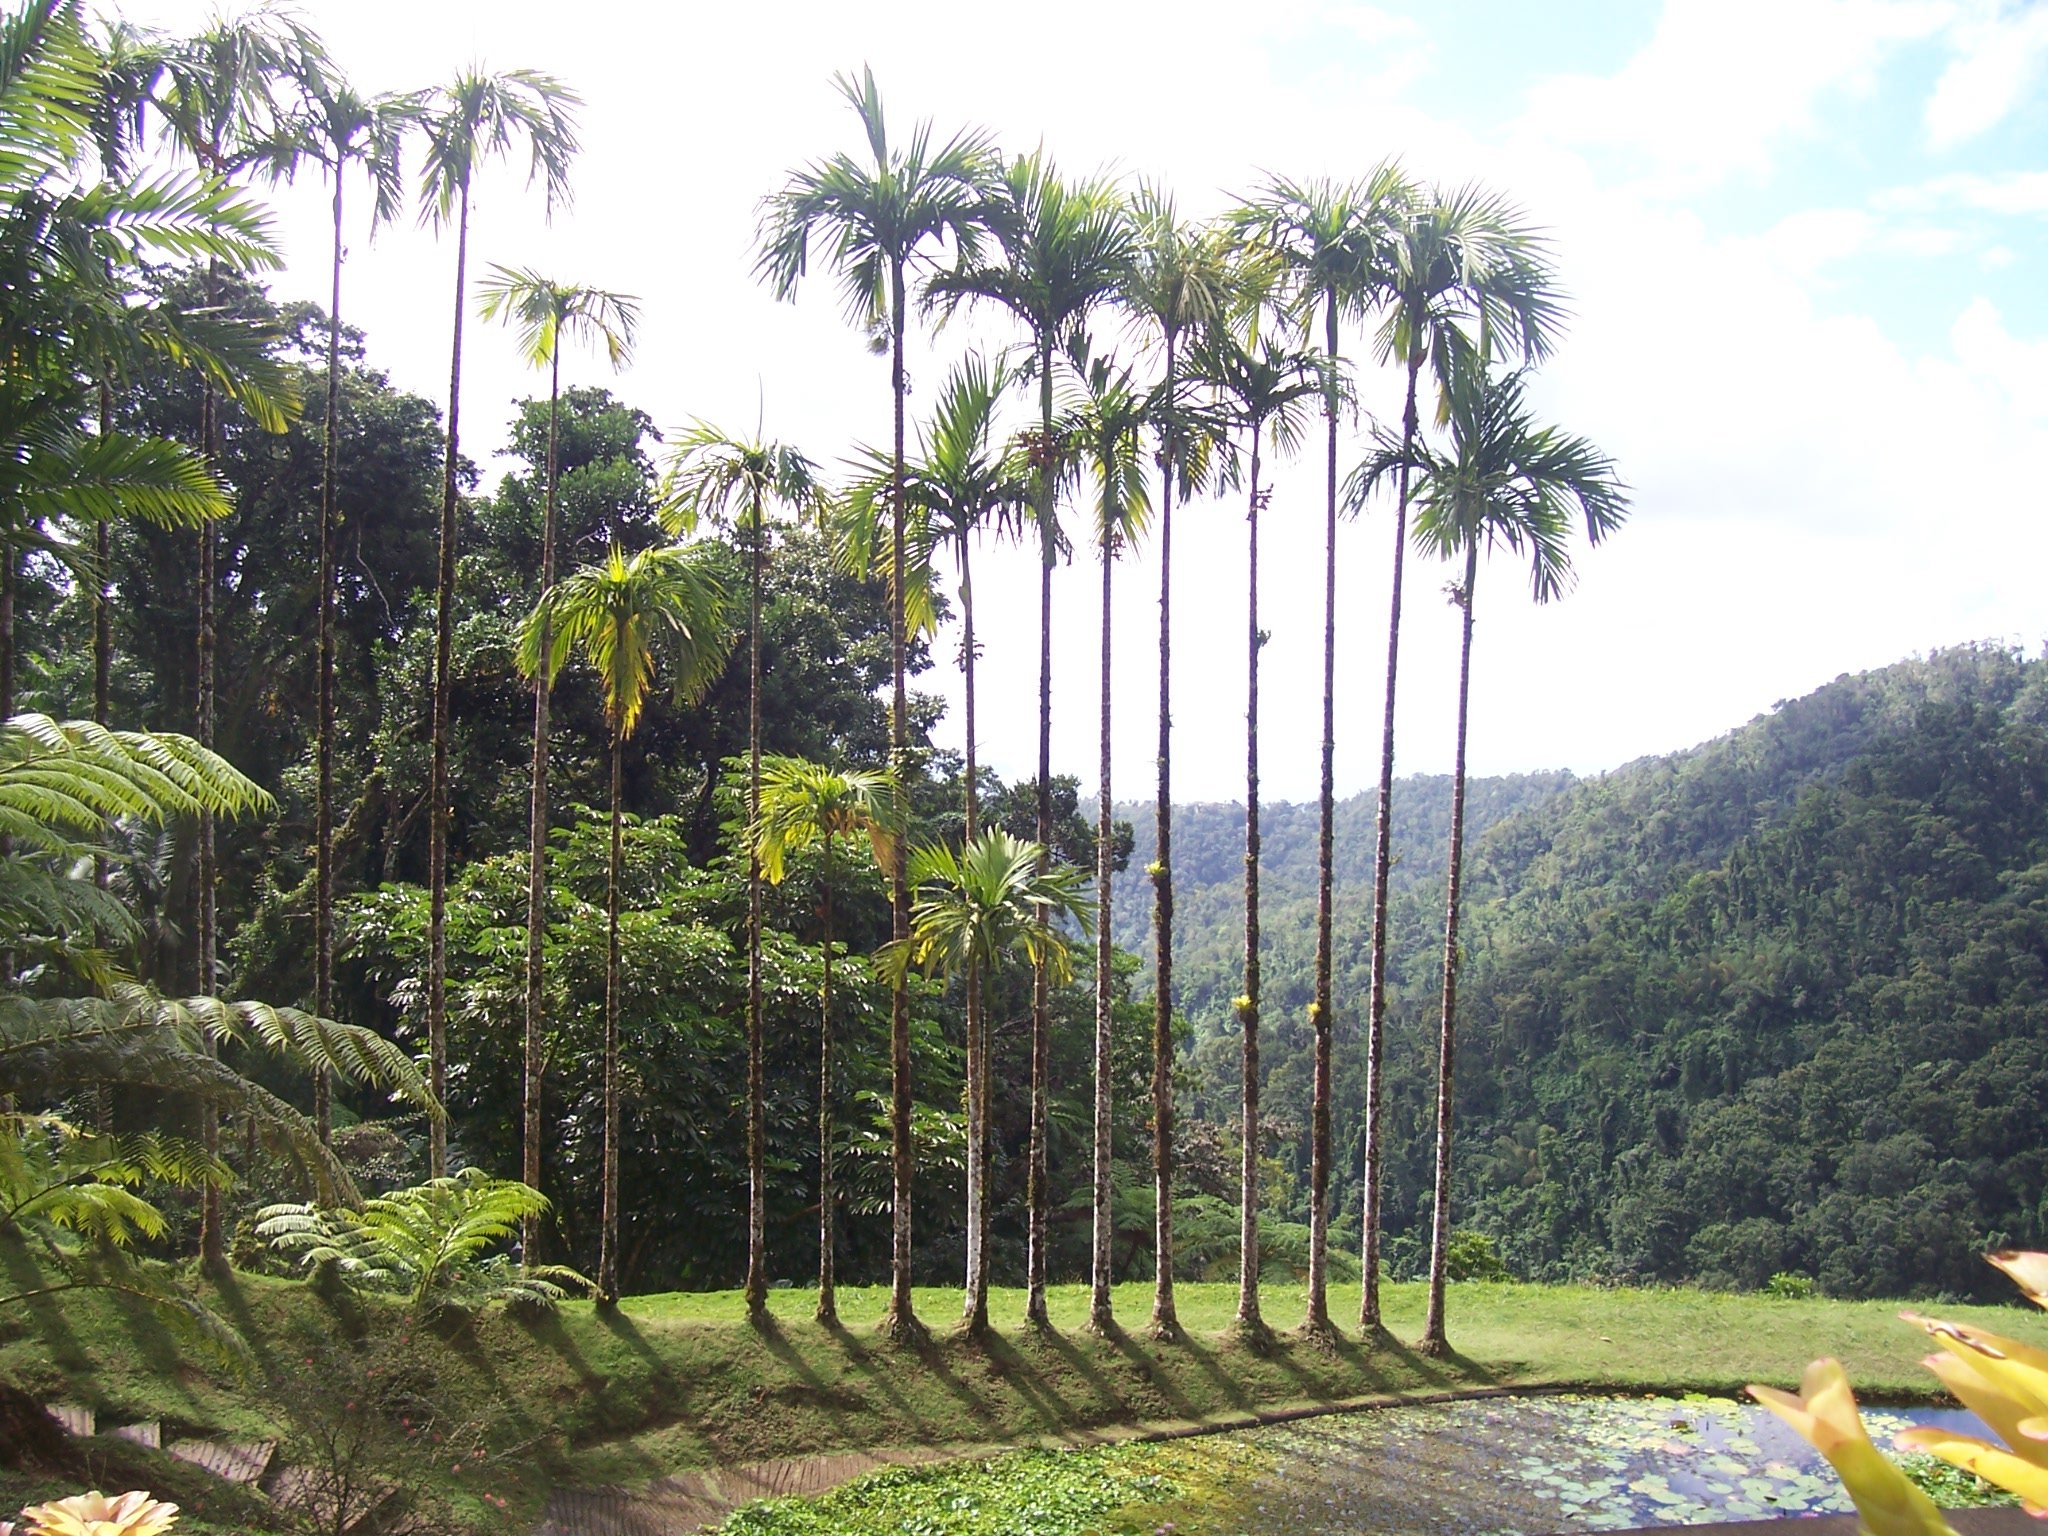 Jardin de balata for Aspersores para riego de jardin